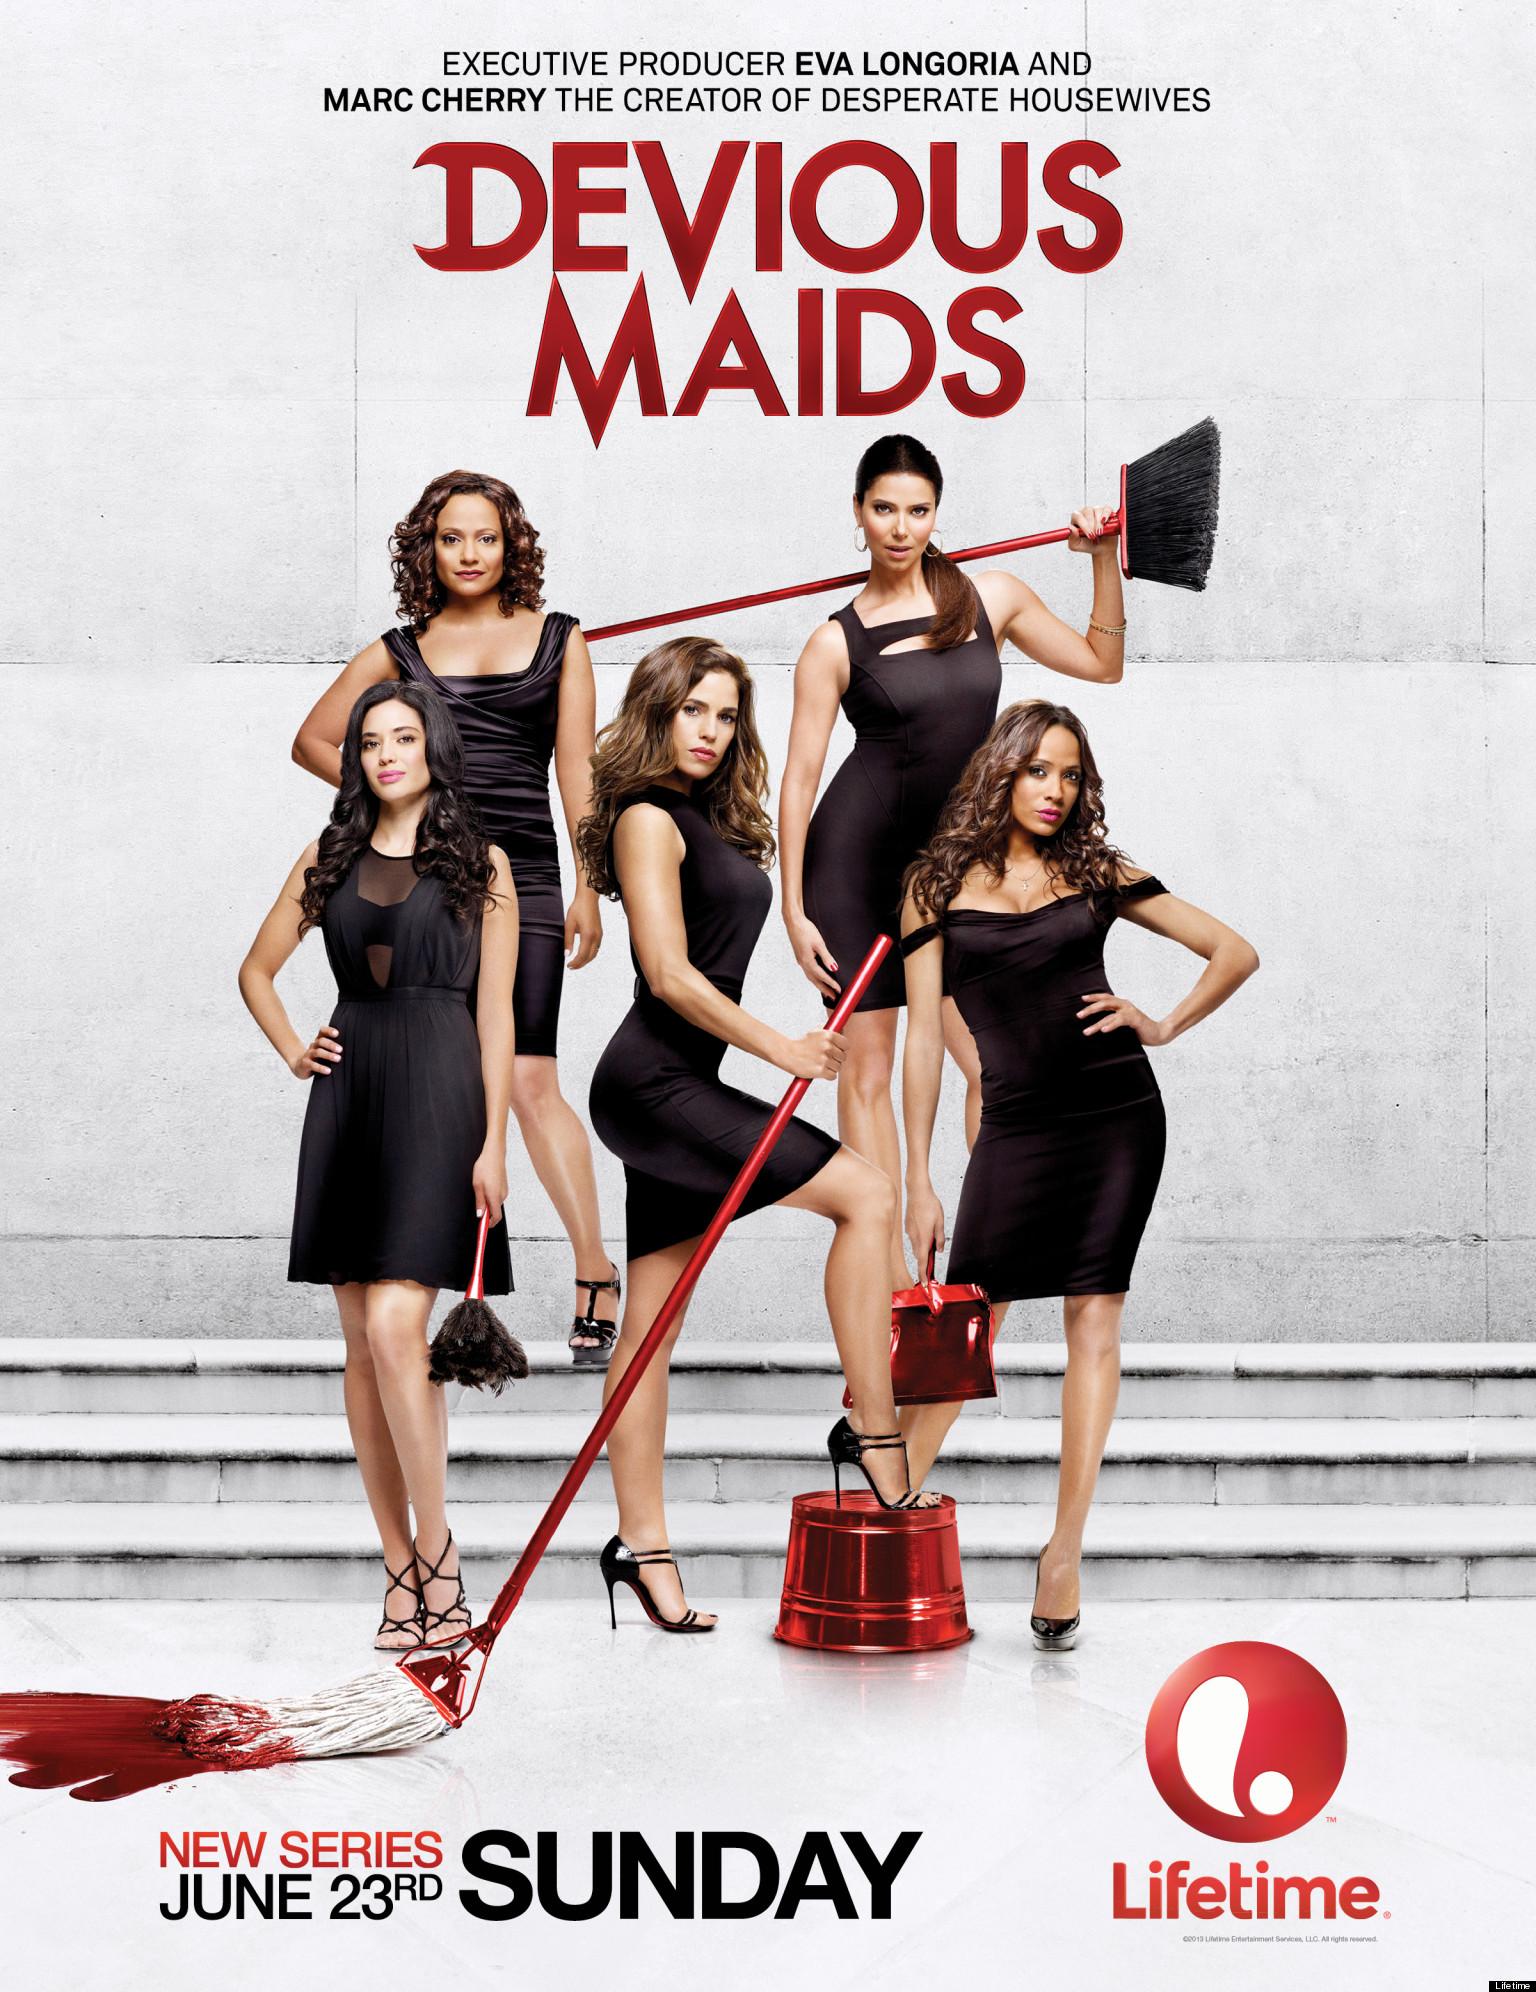 Devious Maids (2013– ) 蛇蝎女佣 Latest?cb=20130808030441&path-prefix=es